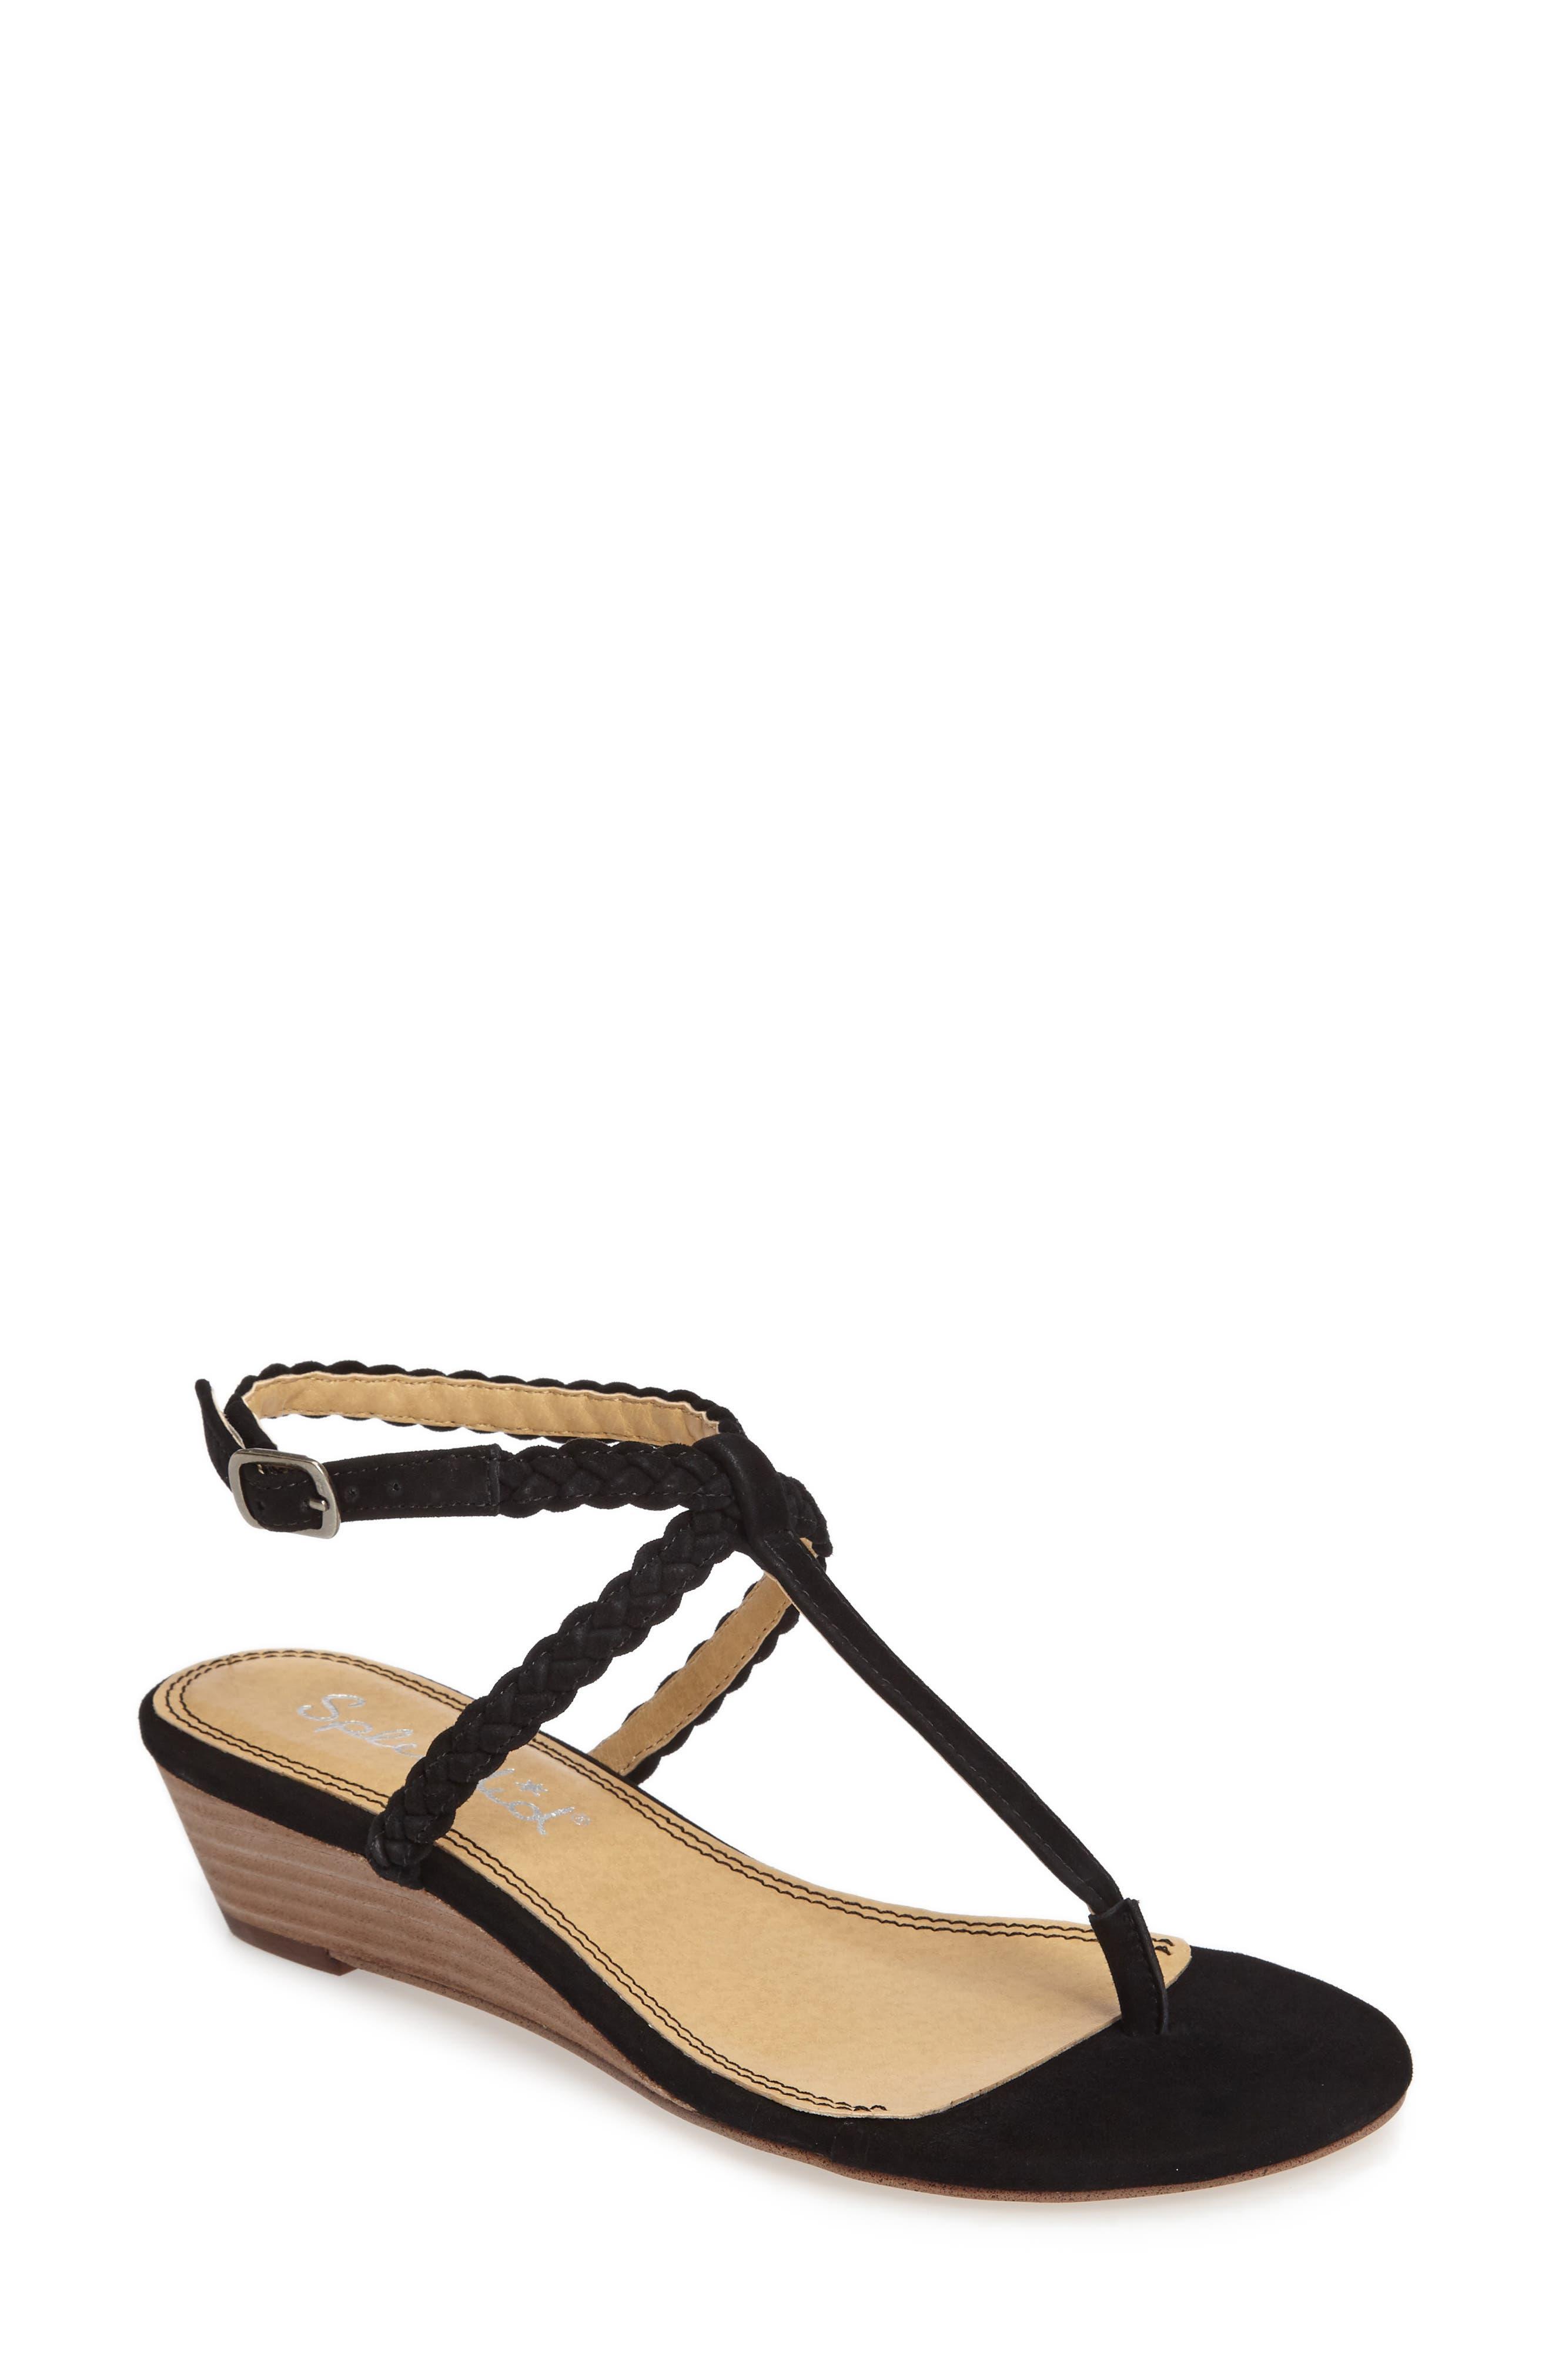 Jadia T-Strap Sandal,                         Main,                         color, Black Suede